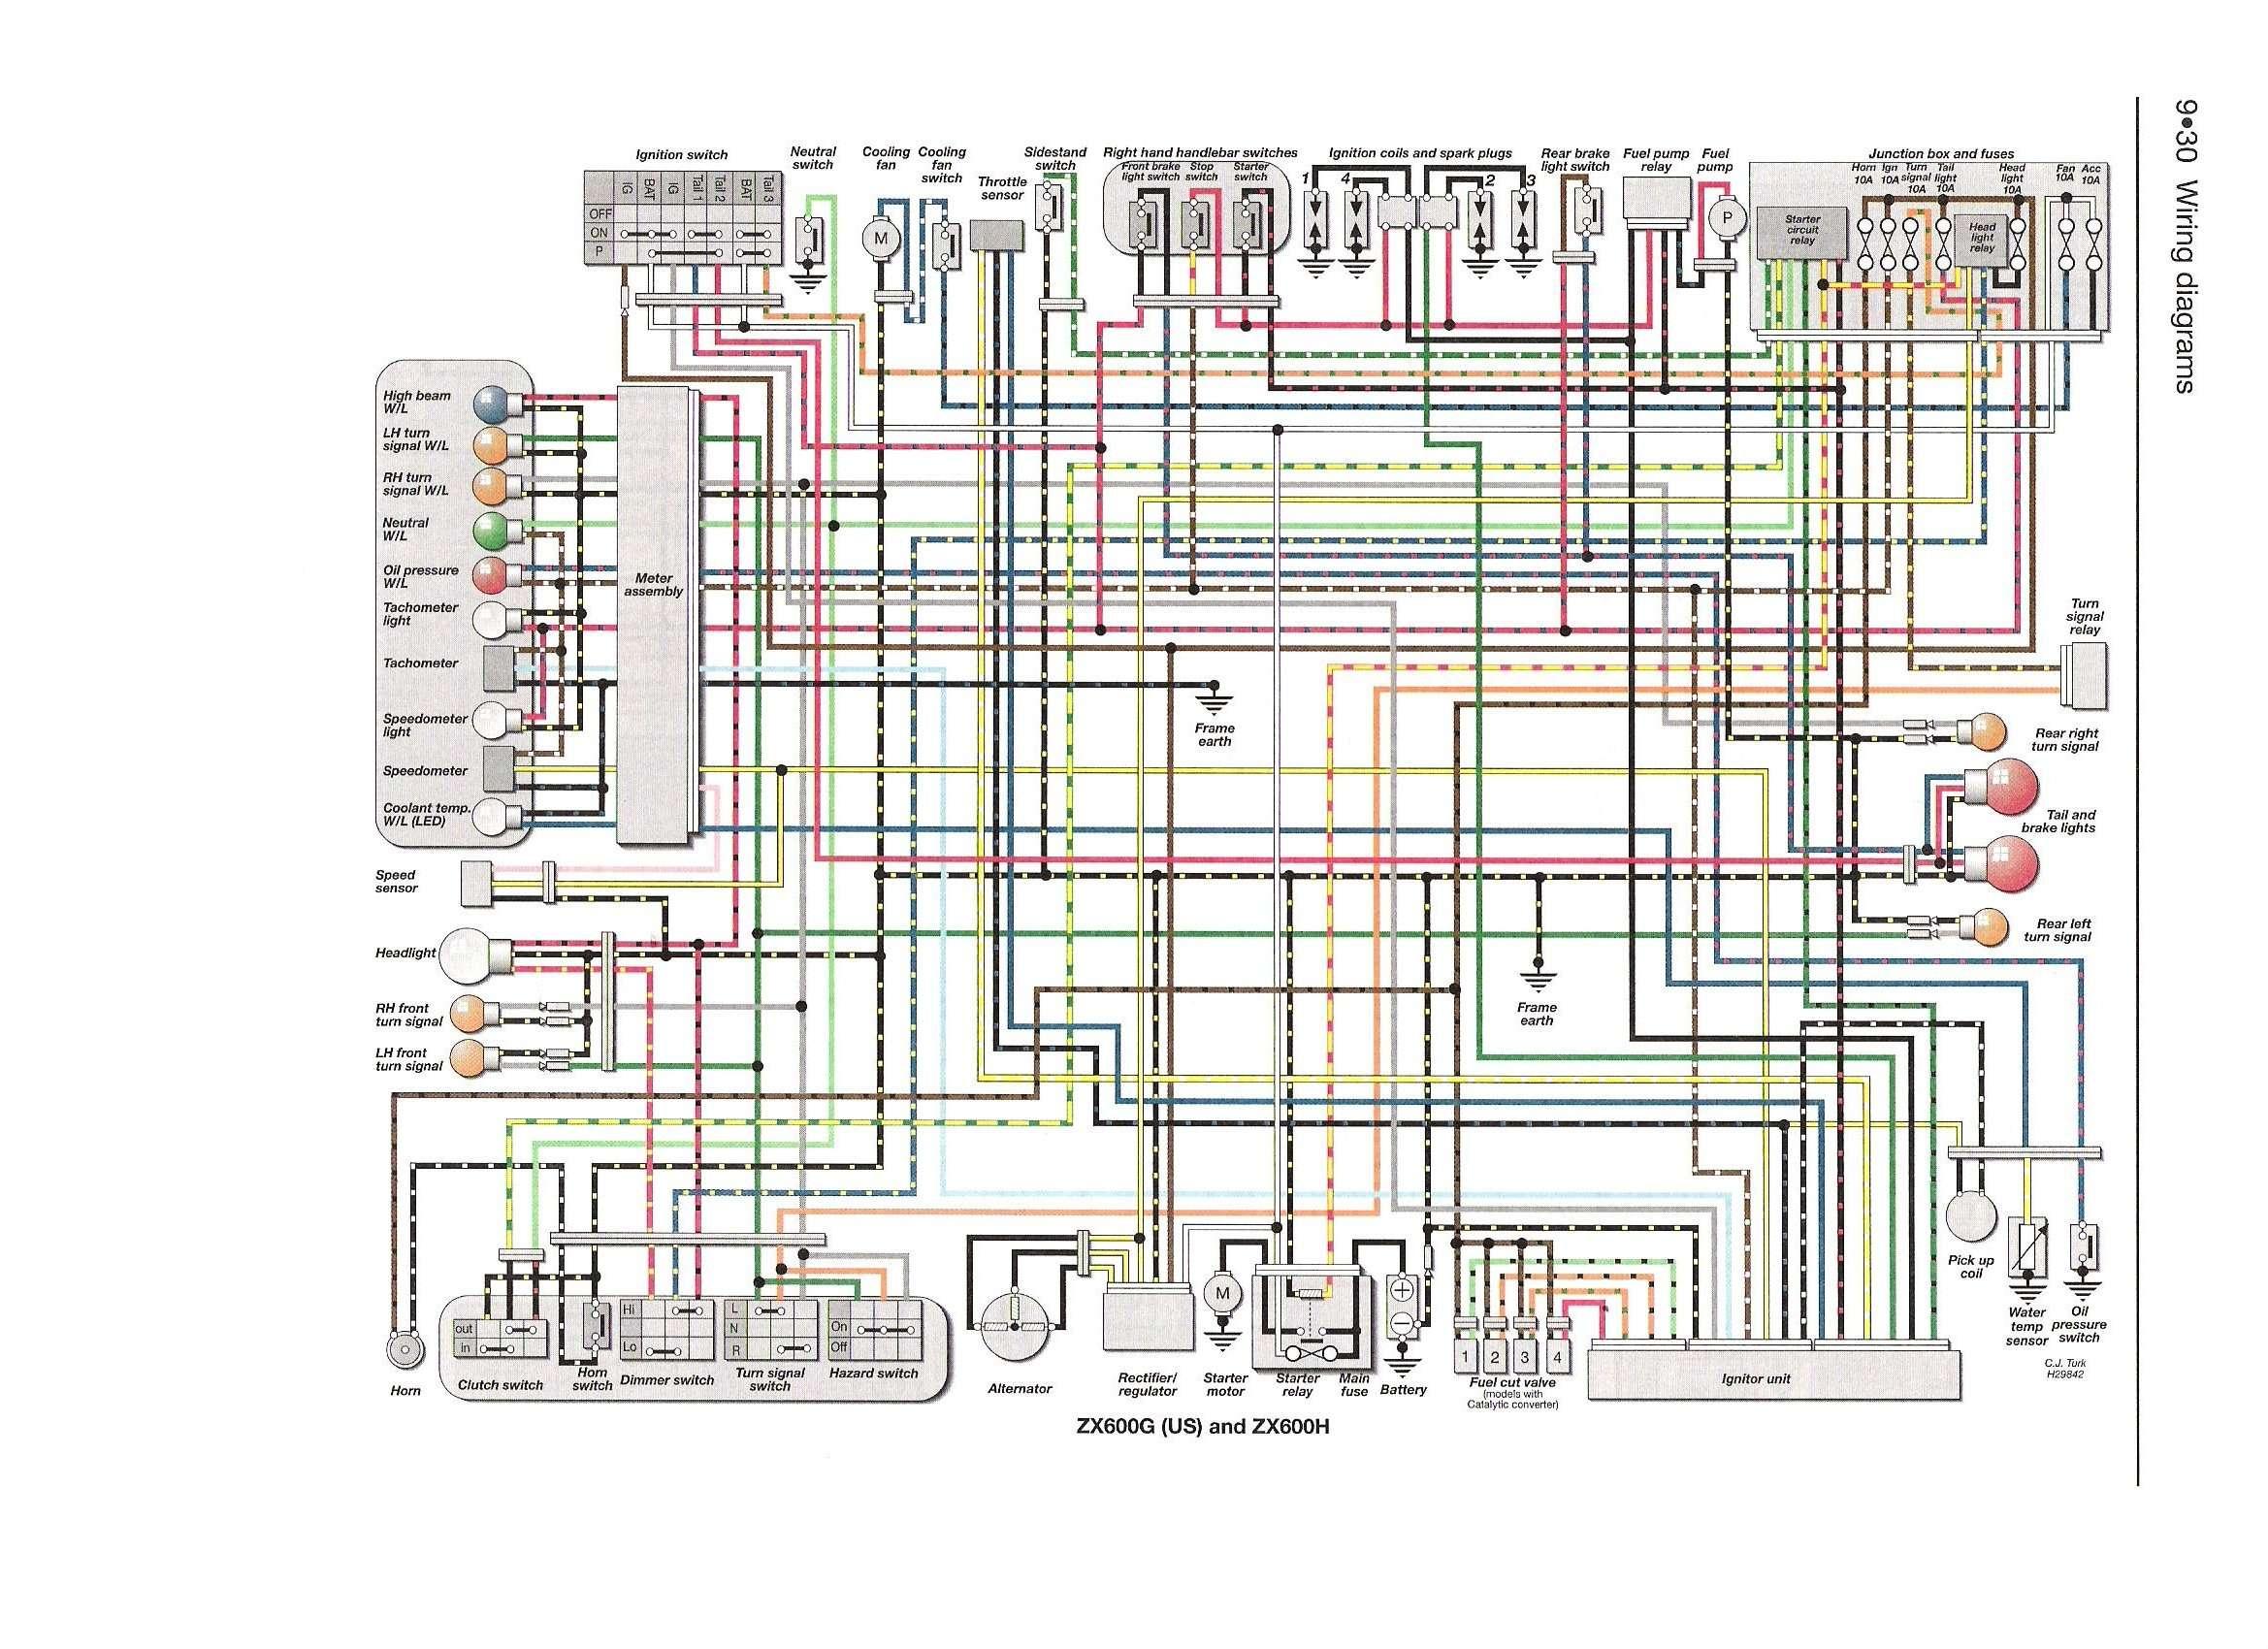 Zx10 Wiring Diagram - Wiring Diagram K3 on